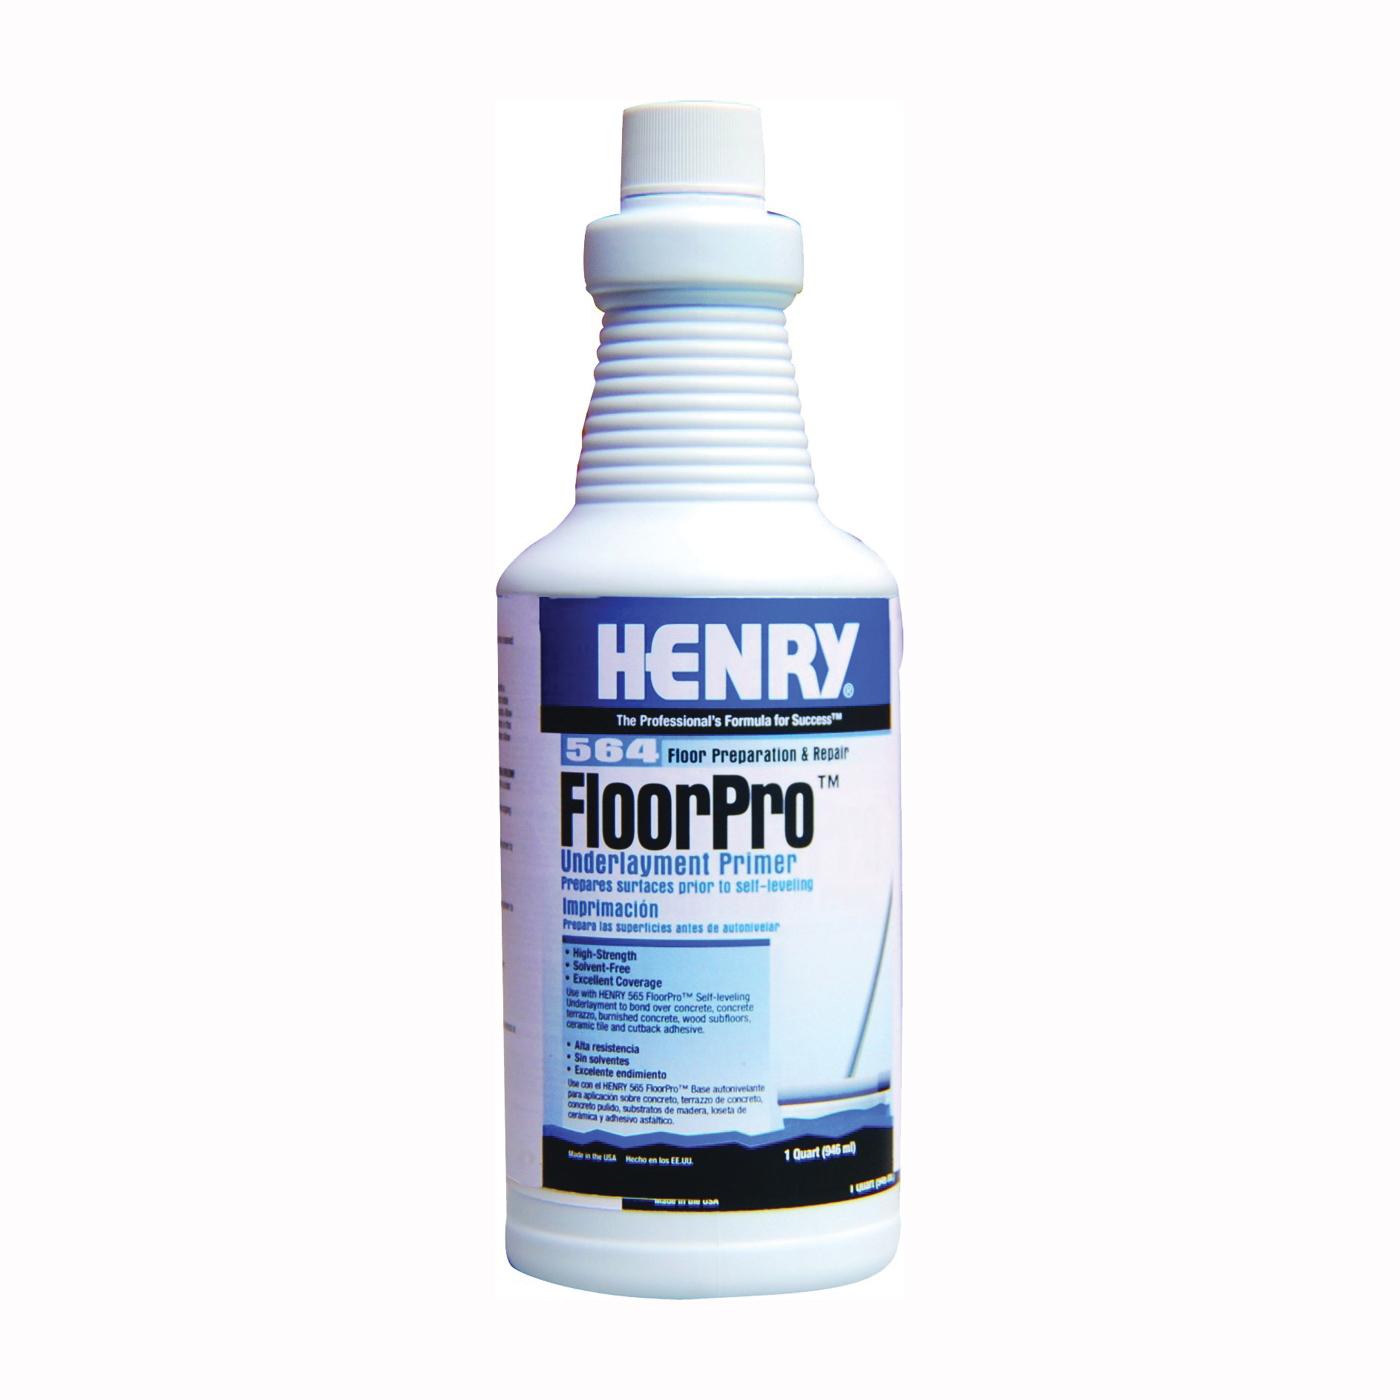 Picture of HENRY FloorPro 12166 Underlayment Primer, 1 qt, Bottle, Light Pink, Liquid